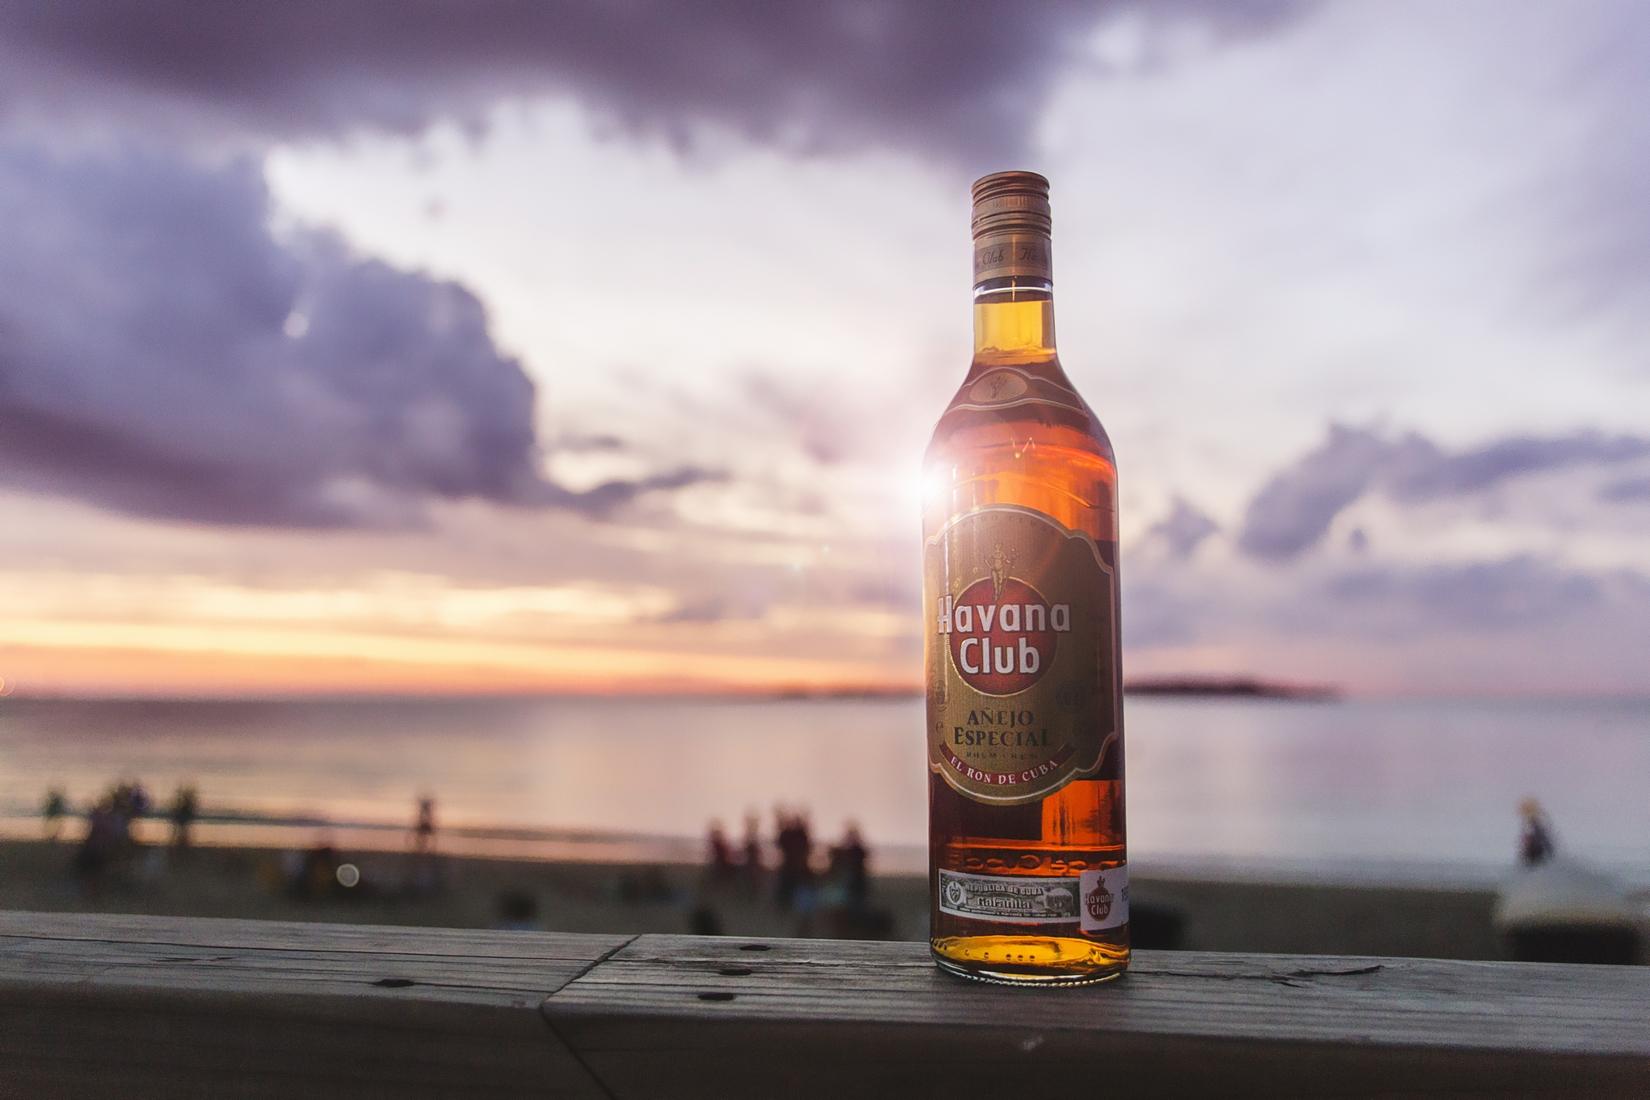 Sunset en OVO – Havana Club